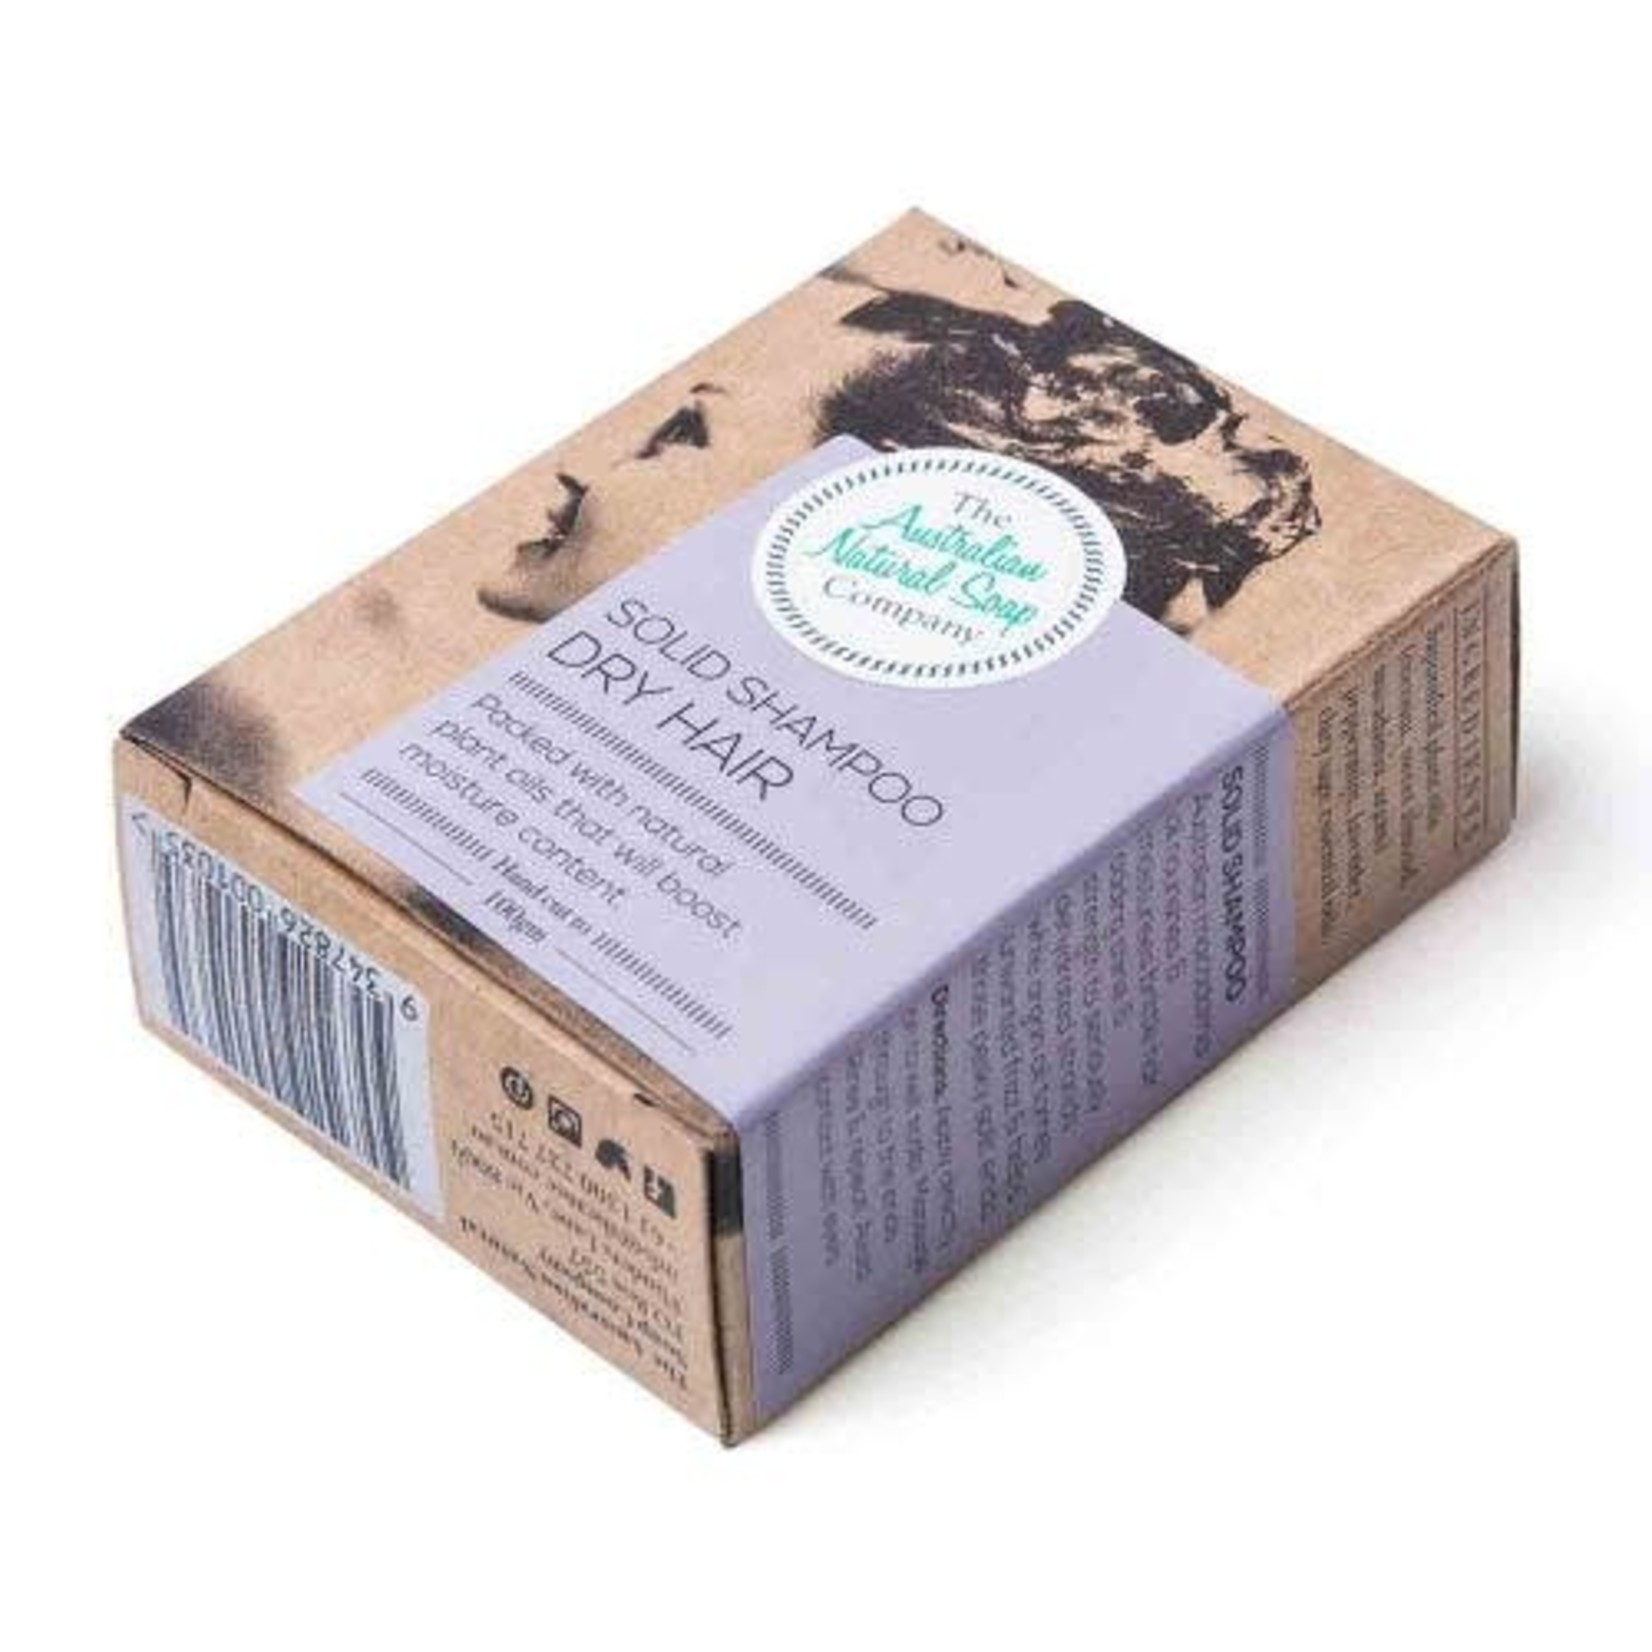 The Australian Natural Soap Company The Australian Natural Soap Company Shampoo Bar Dry Hair